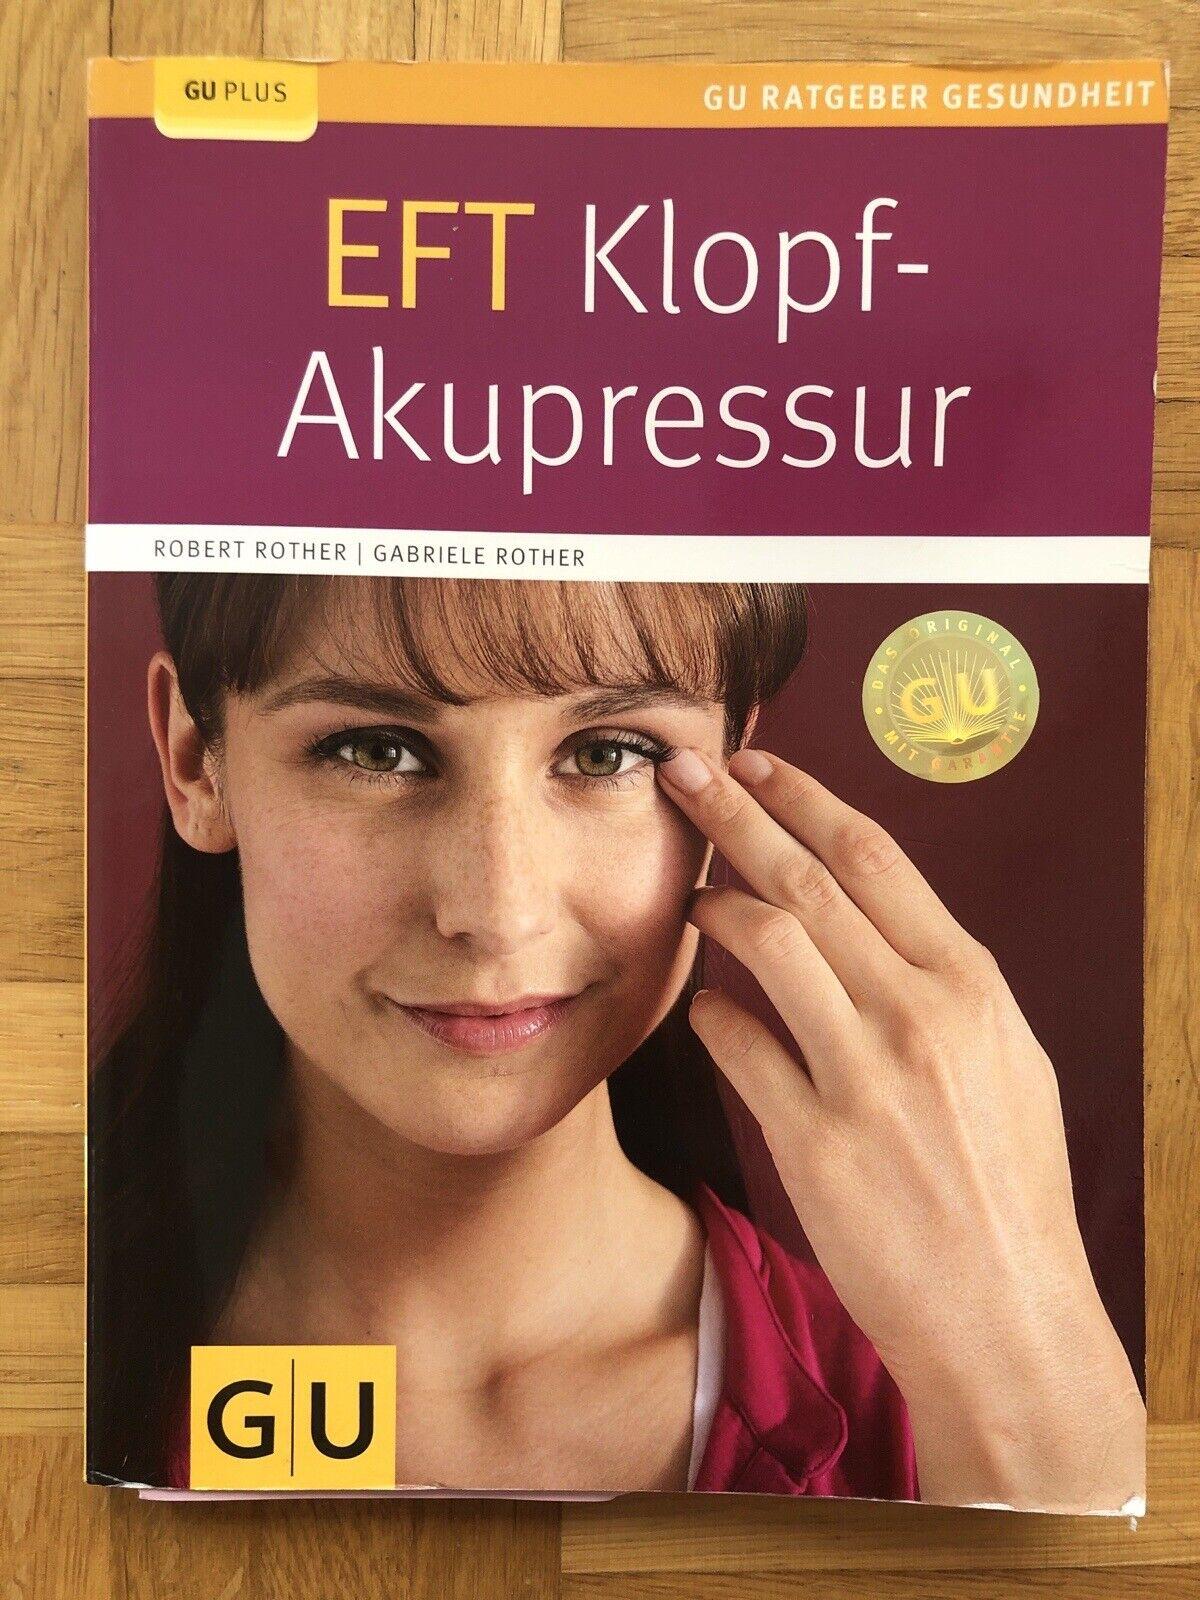 EFT Klopf-Akupressur Rother GU Plus Ratgeber Klopfen Praxis Buch Fachbuch - Robert Rother, Gabriele Rother